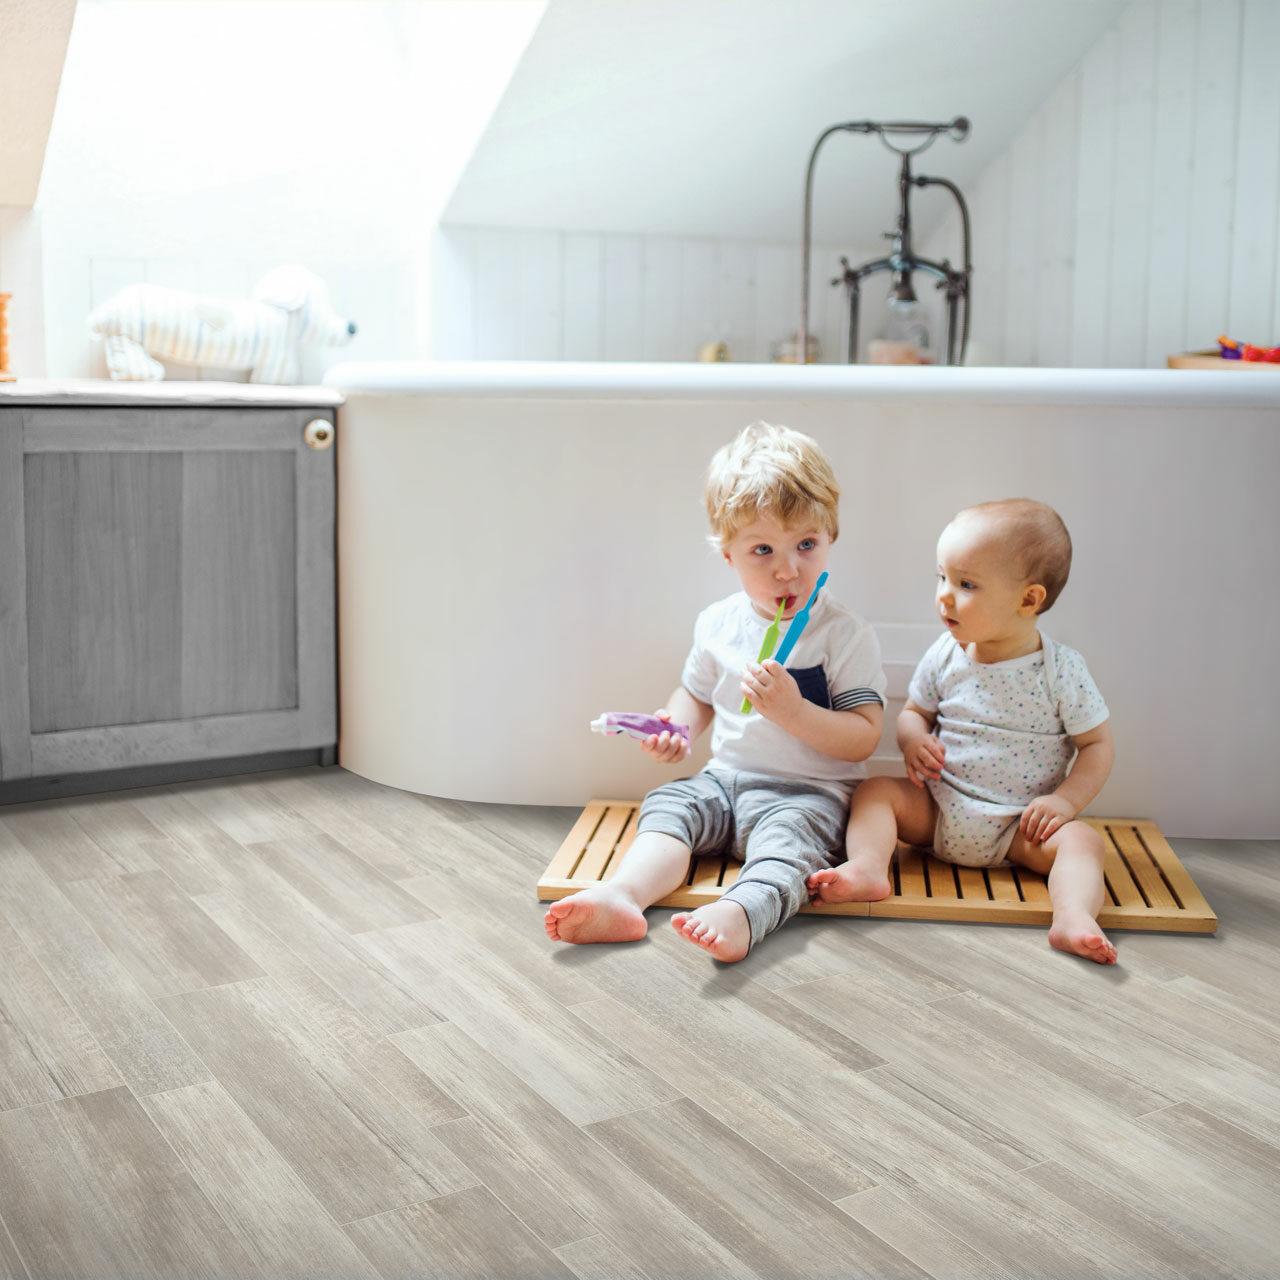 Kids playing on floor | Flooring 101